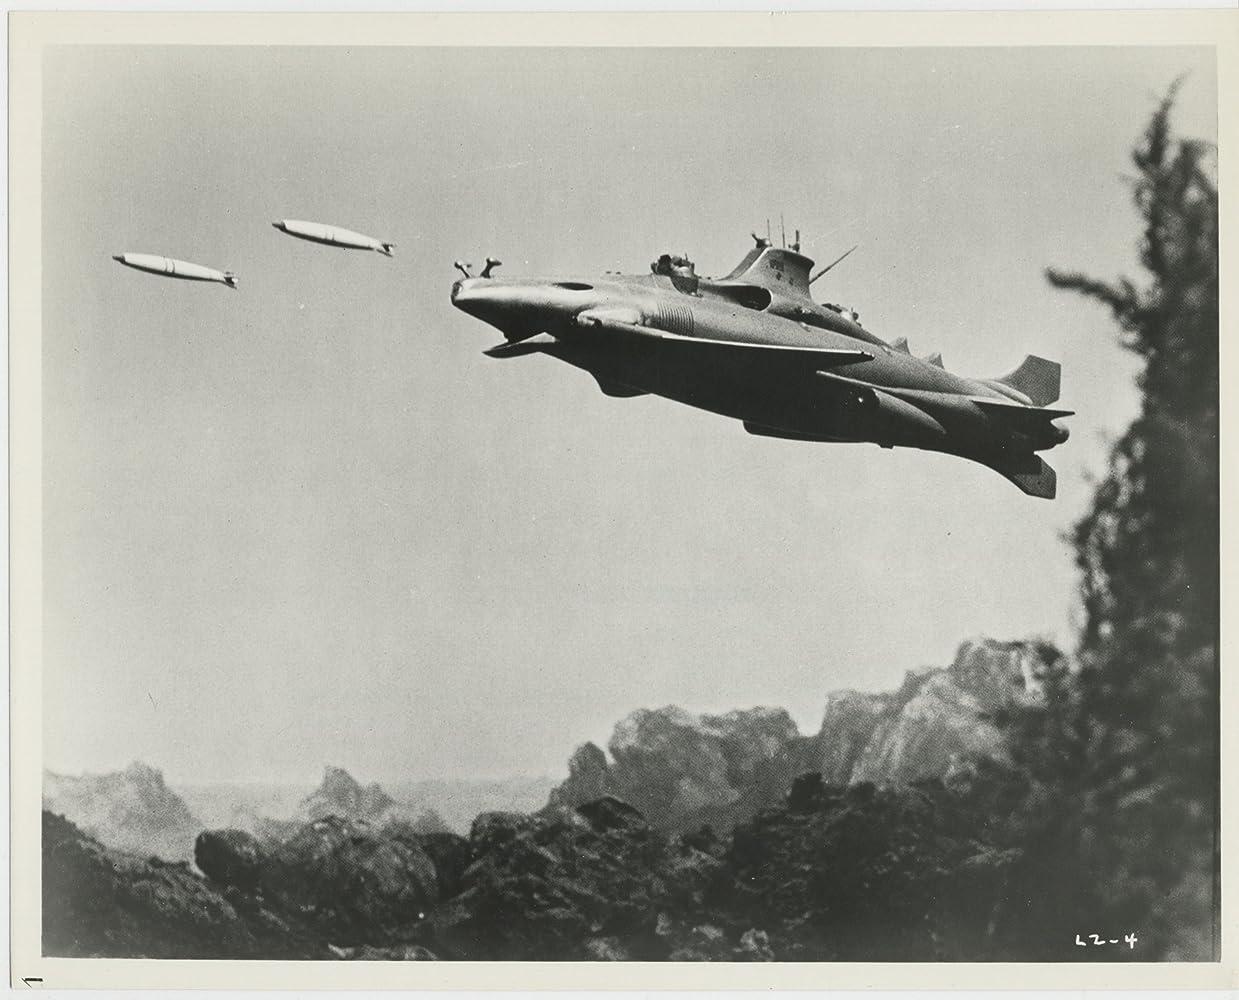 Ido zero daisakusen (1969)